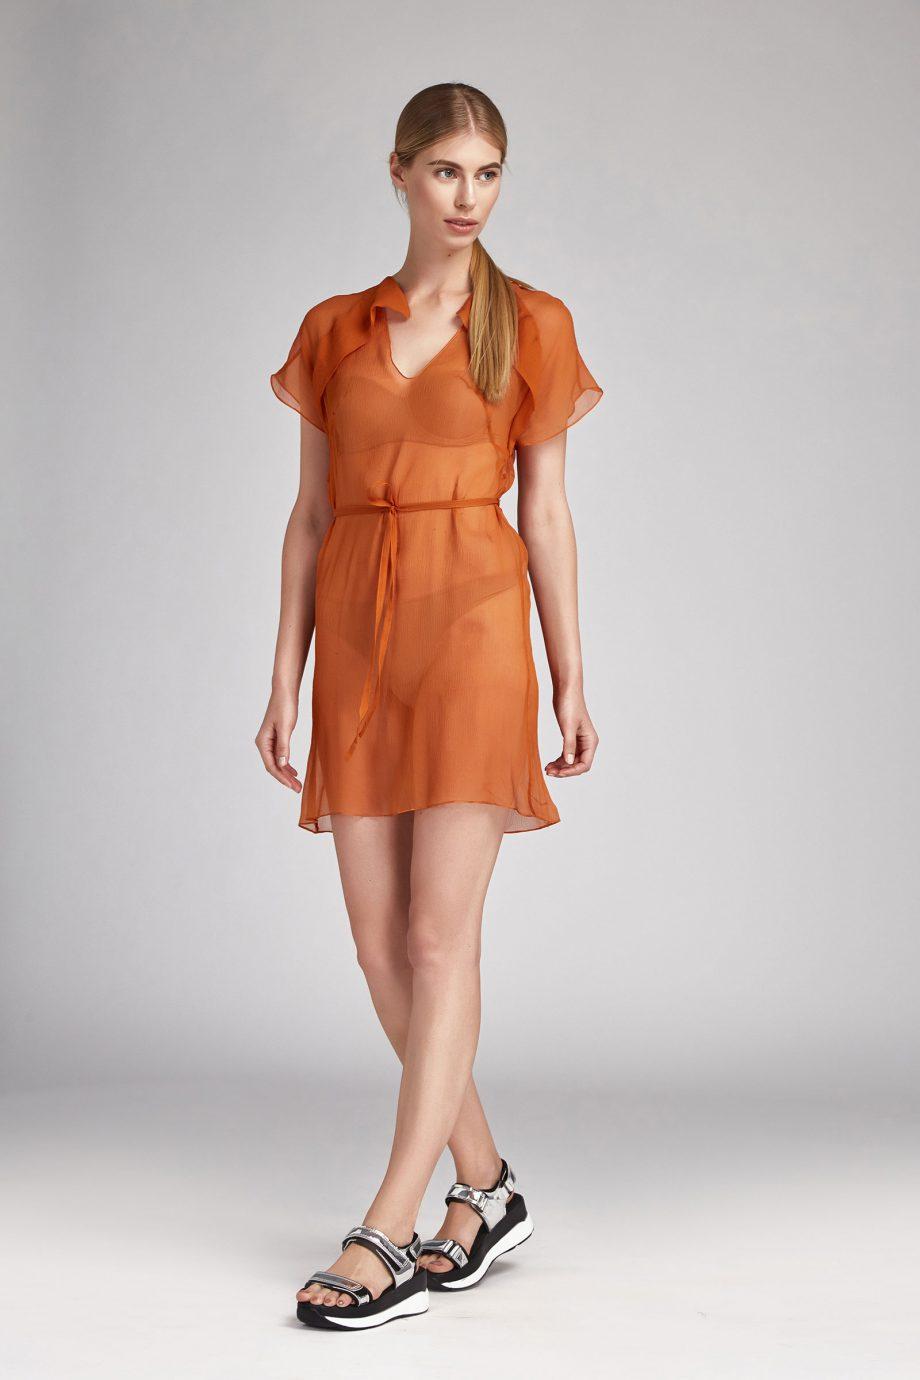 orange-bud-02